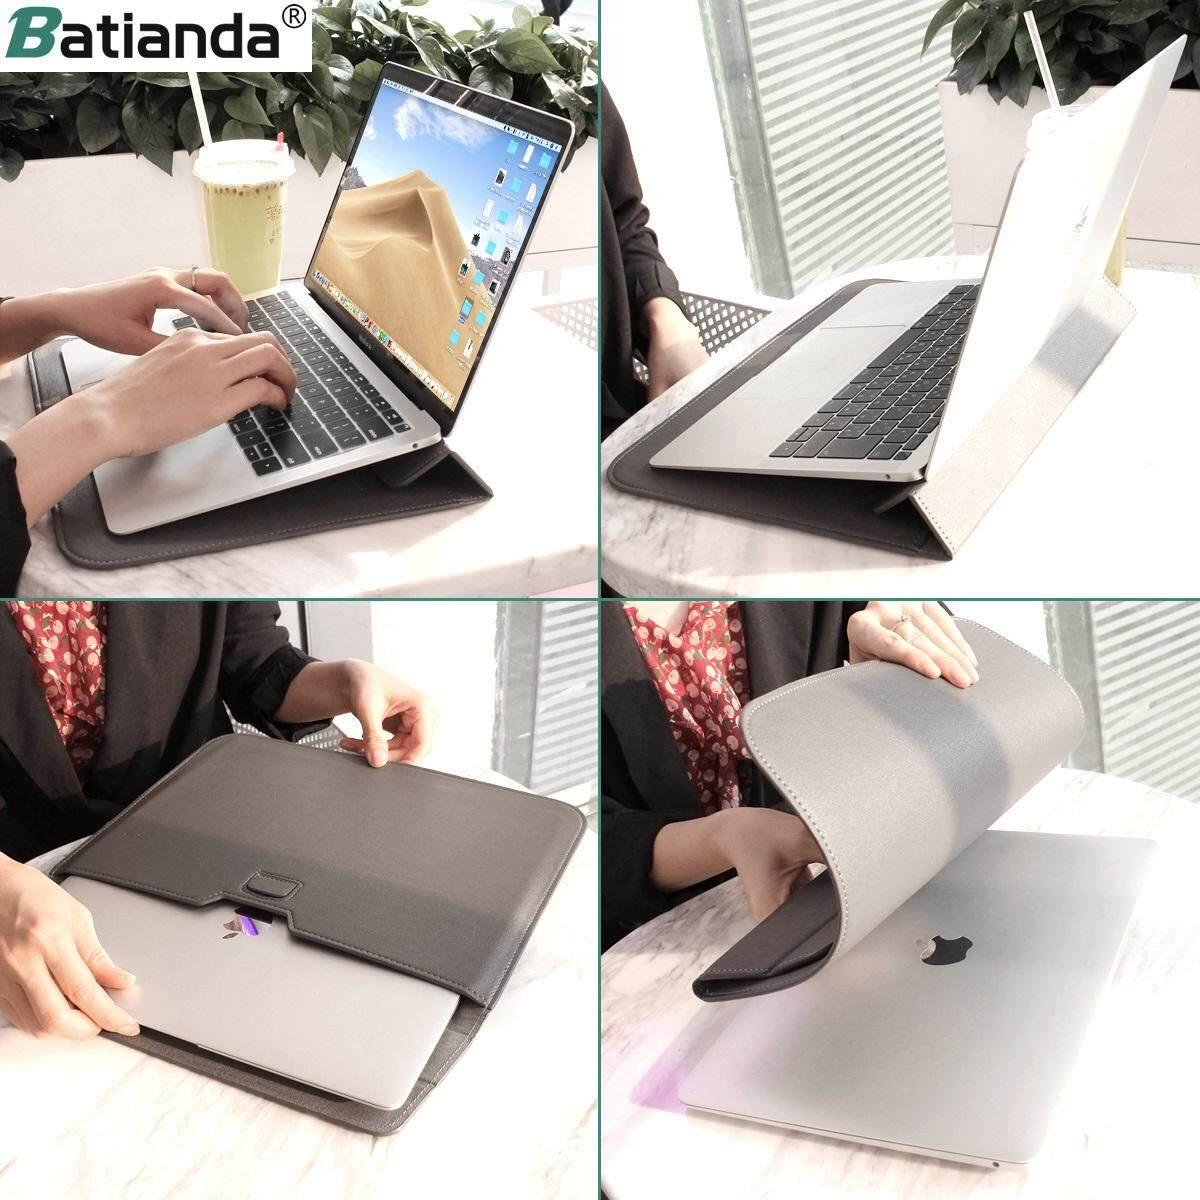 291fe0d8157b Laptop Bag 11 13 15 inch For MacBook Air Pro 13 15 Case,Laptop Sleeve  Notebook Protective Case Envelope Bag For Apple Mac Book bags Pro 13 15  Case (13 ...